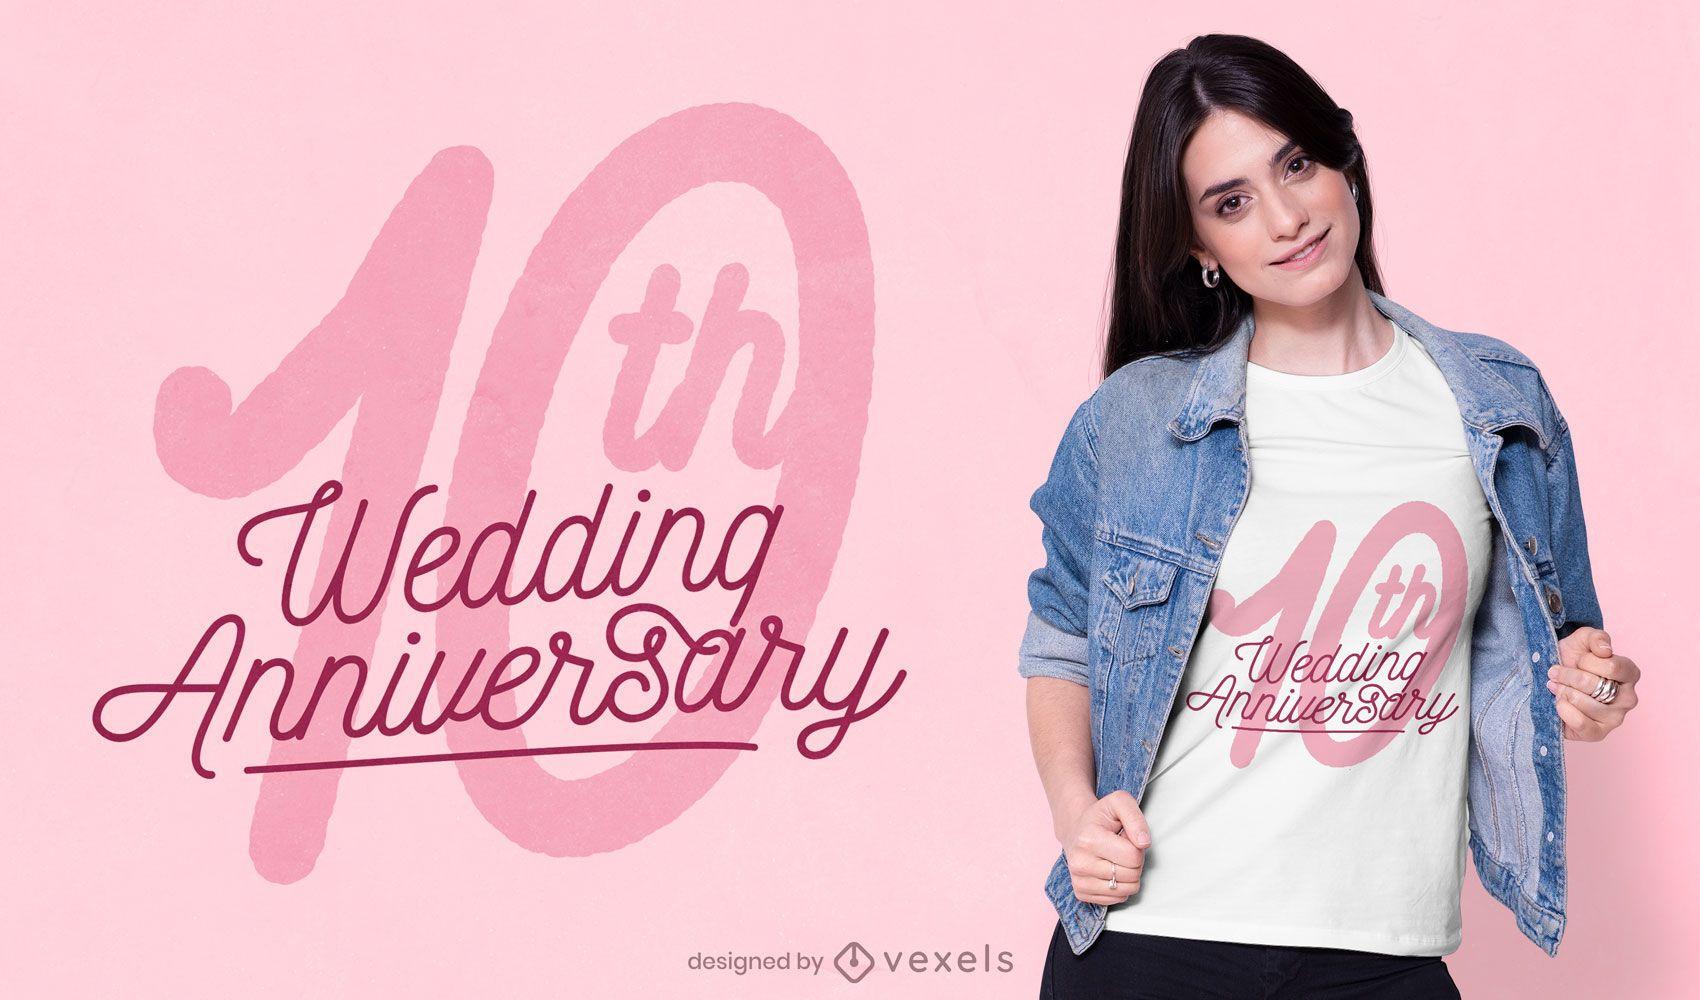 Wedding anniversary t-shirt design